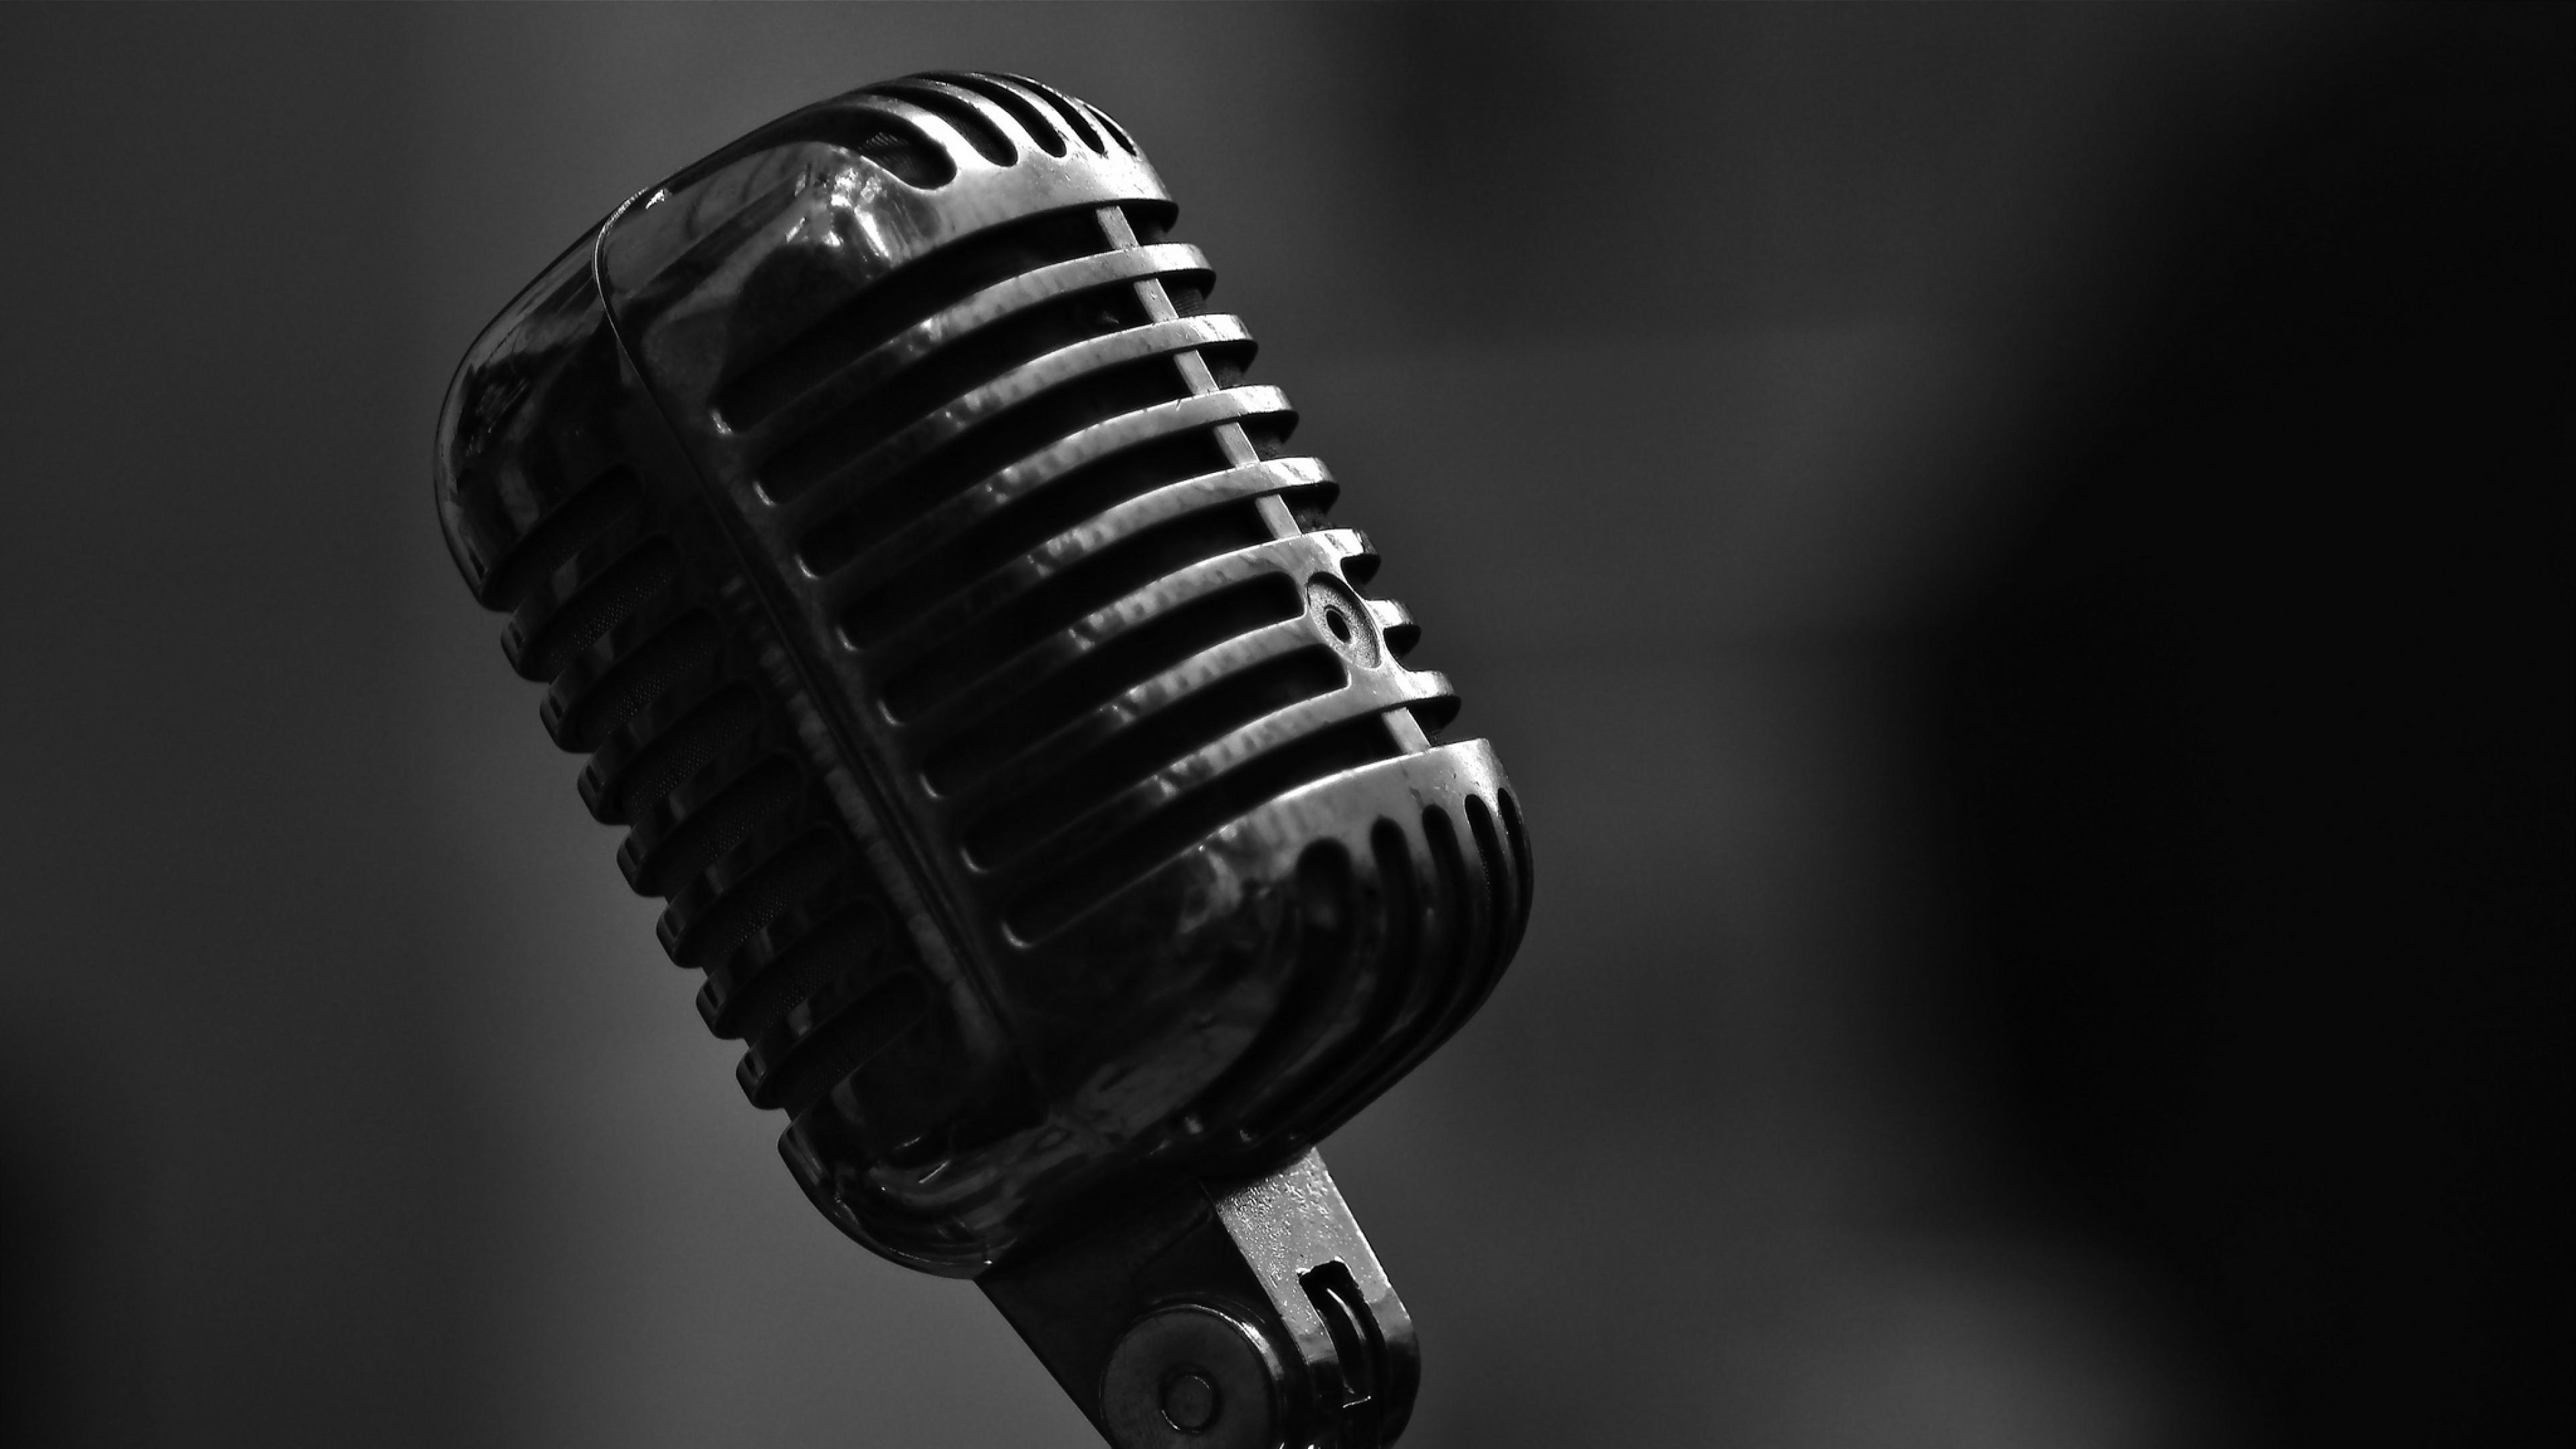 Microphone metal hd music 4k wallpapers images - Microphone wallpaper ...